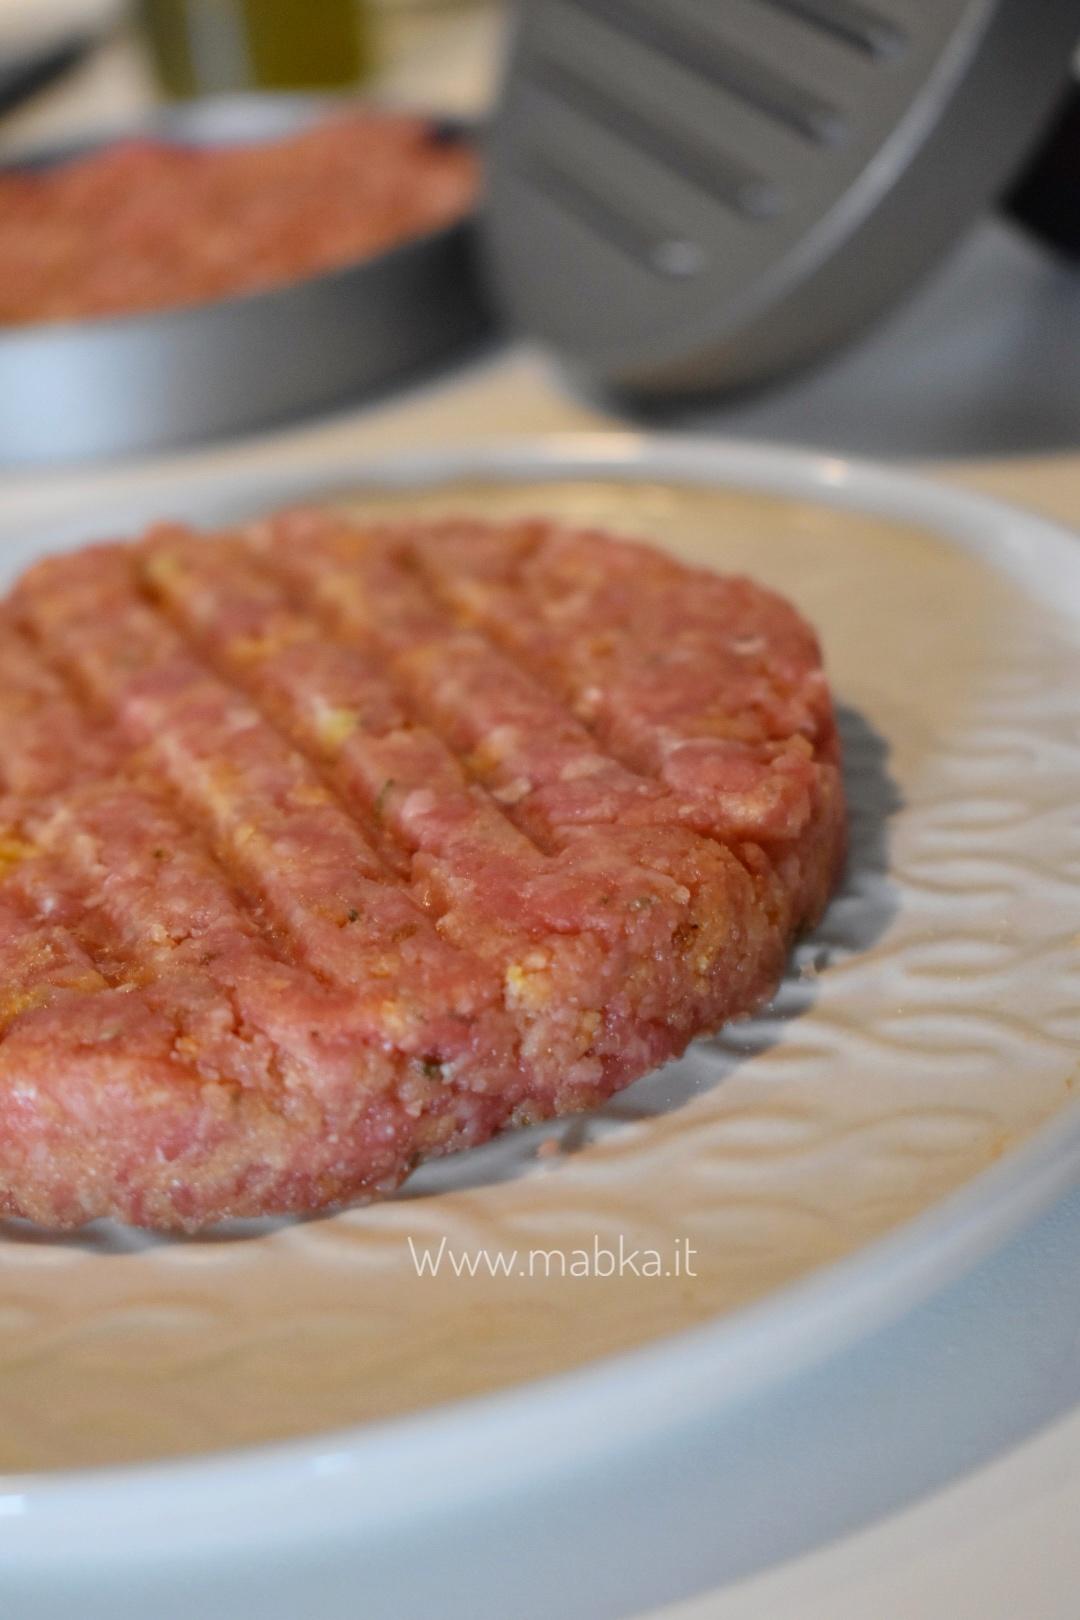 Hamburger senza lattosio, burger, svizzera